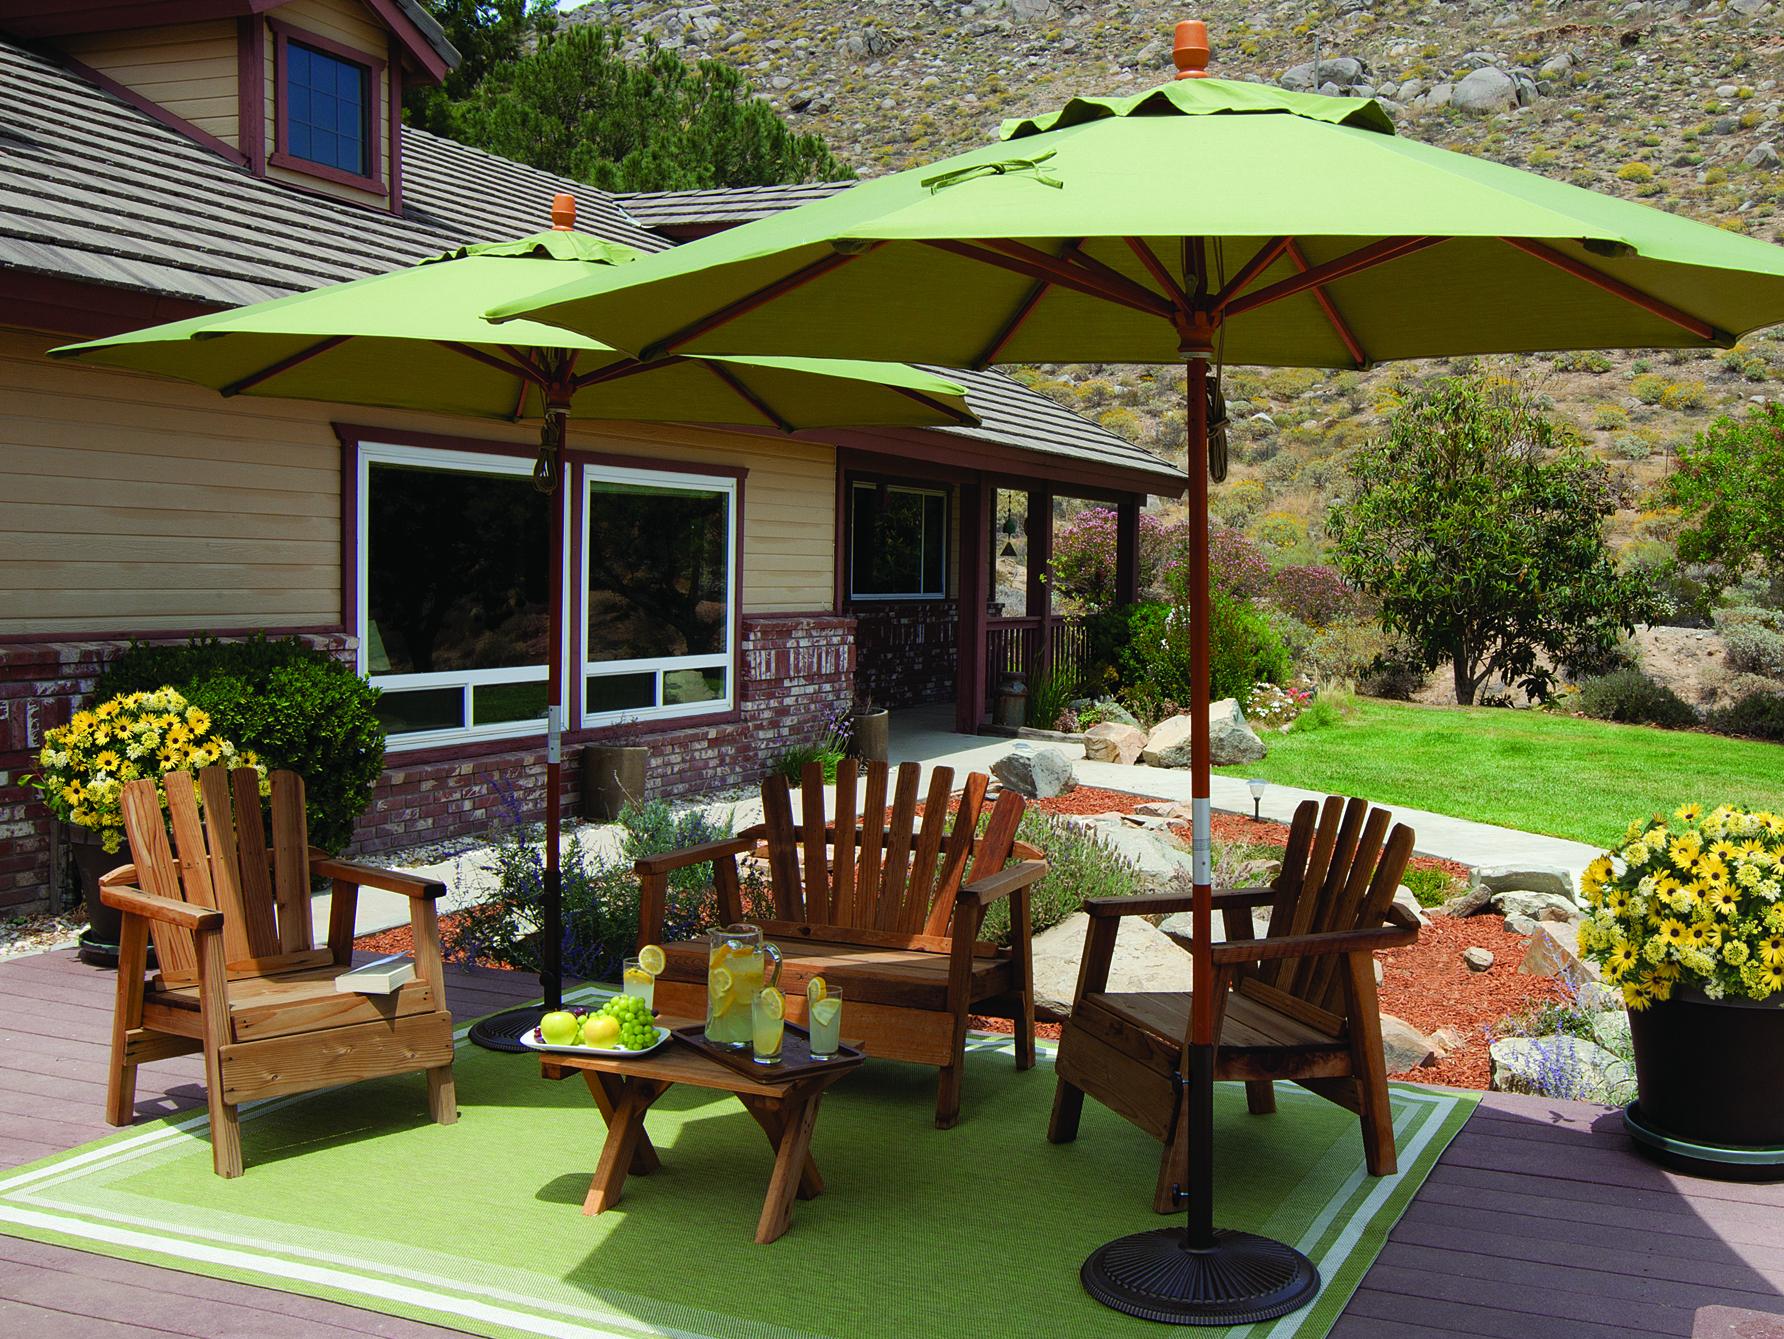 treasure garden market wood 9 39 octagon pully lift umbrella